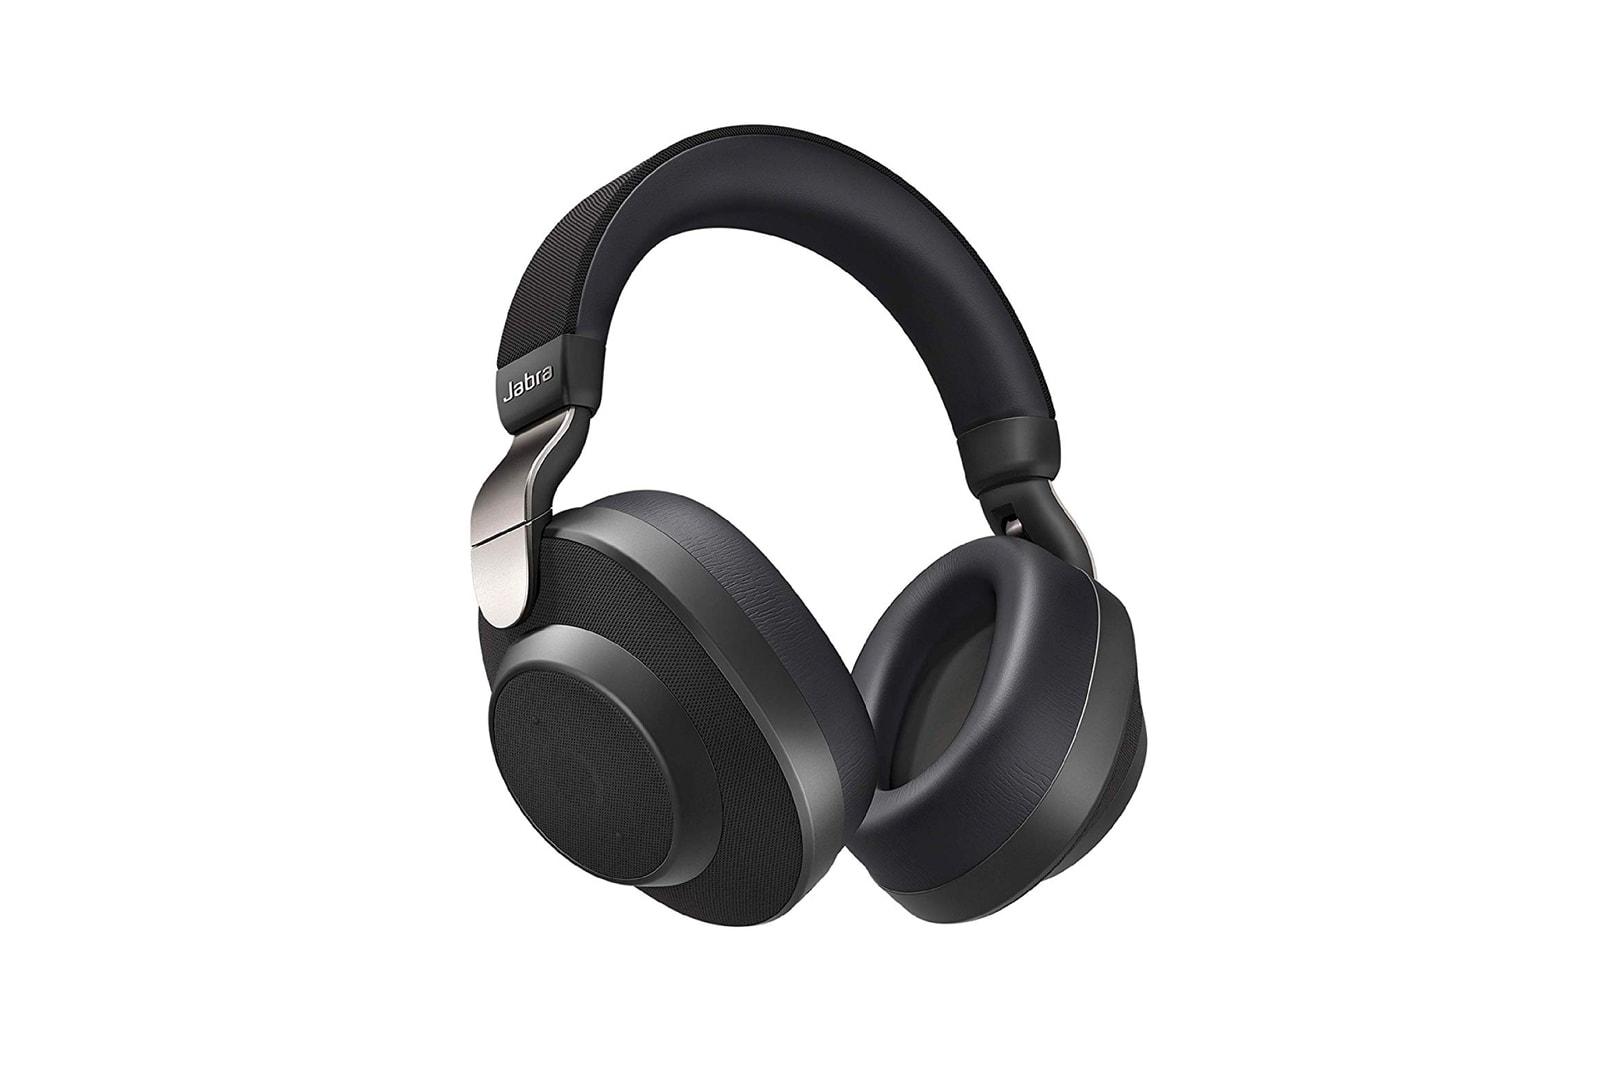 Jabra Elite 85h Bluetooth Headphones